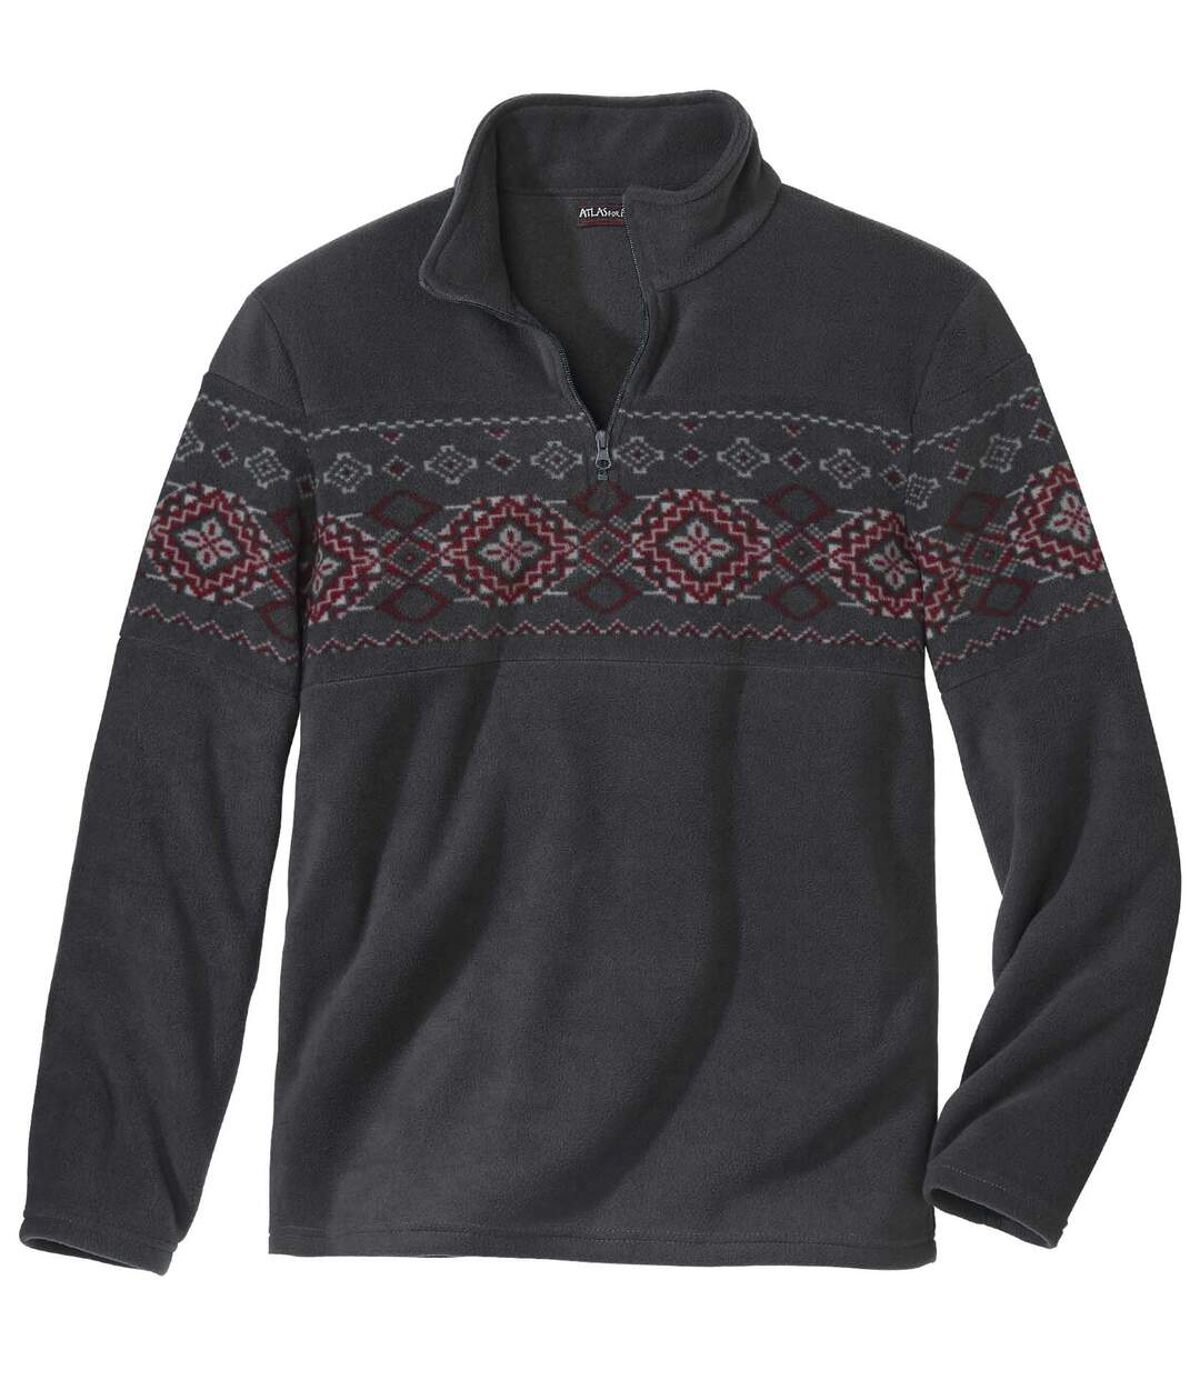 Jacquard mintás cipzáras polár pulóver Atlas For Men